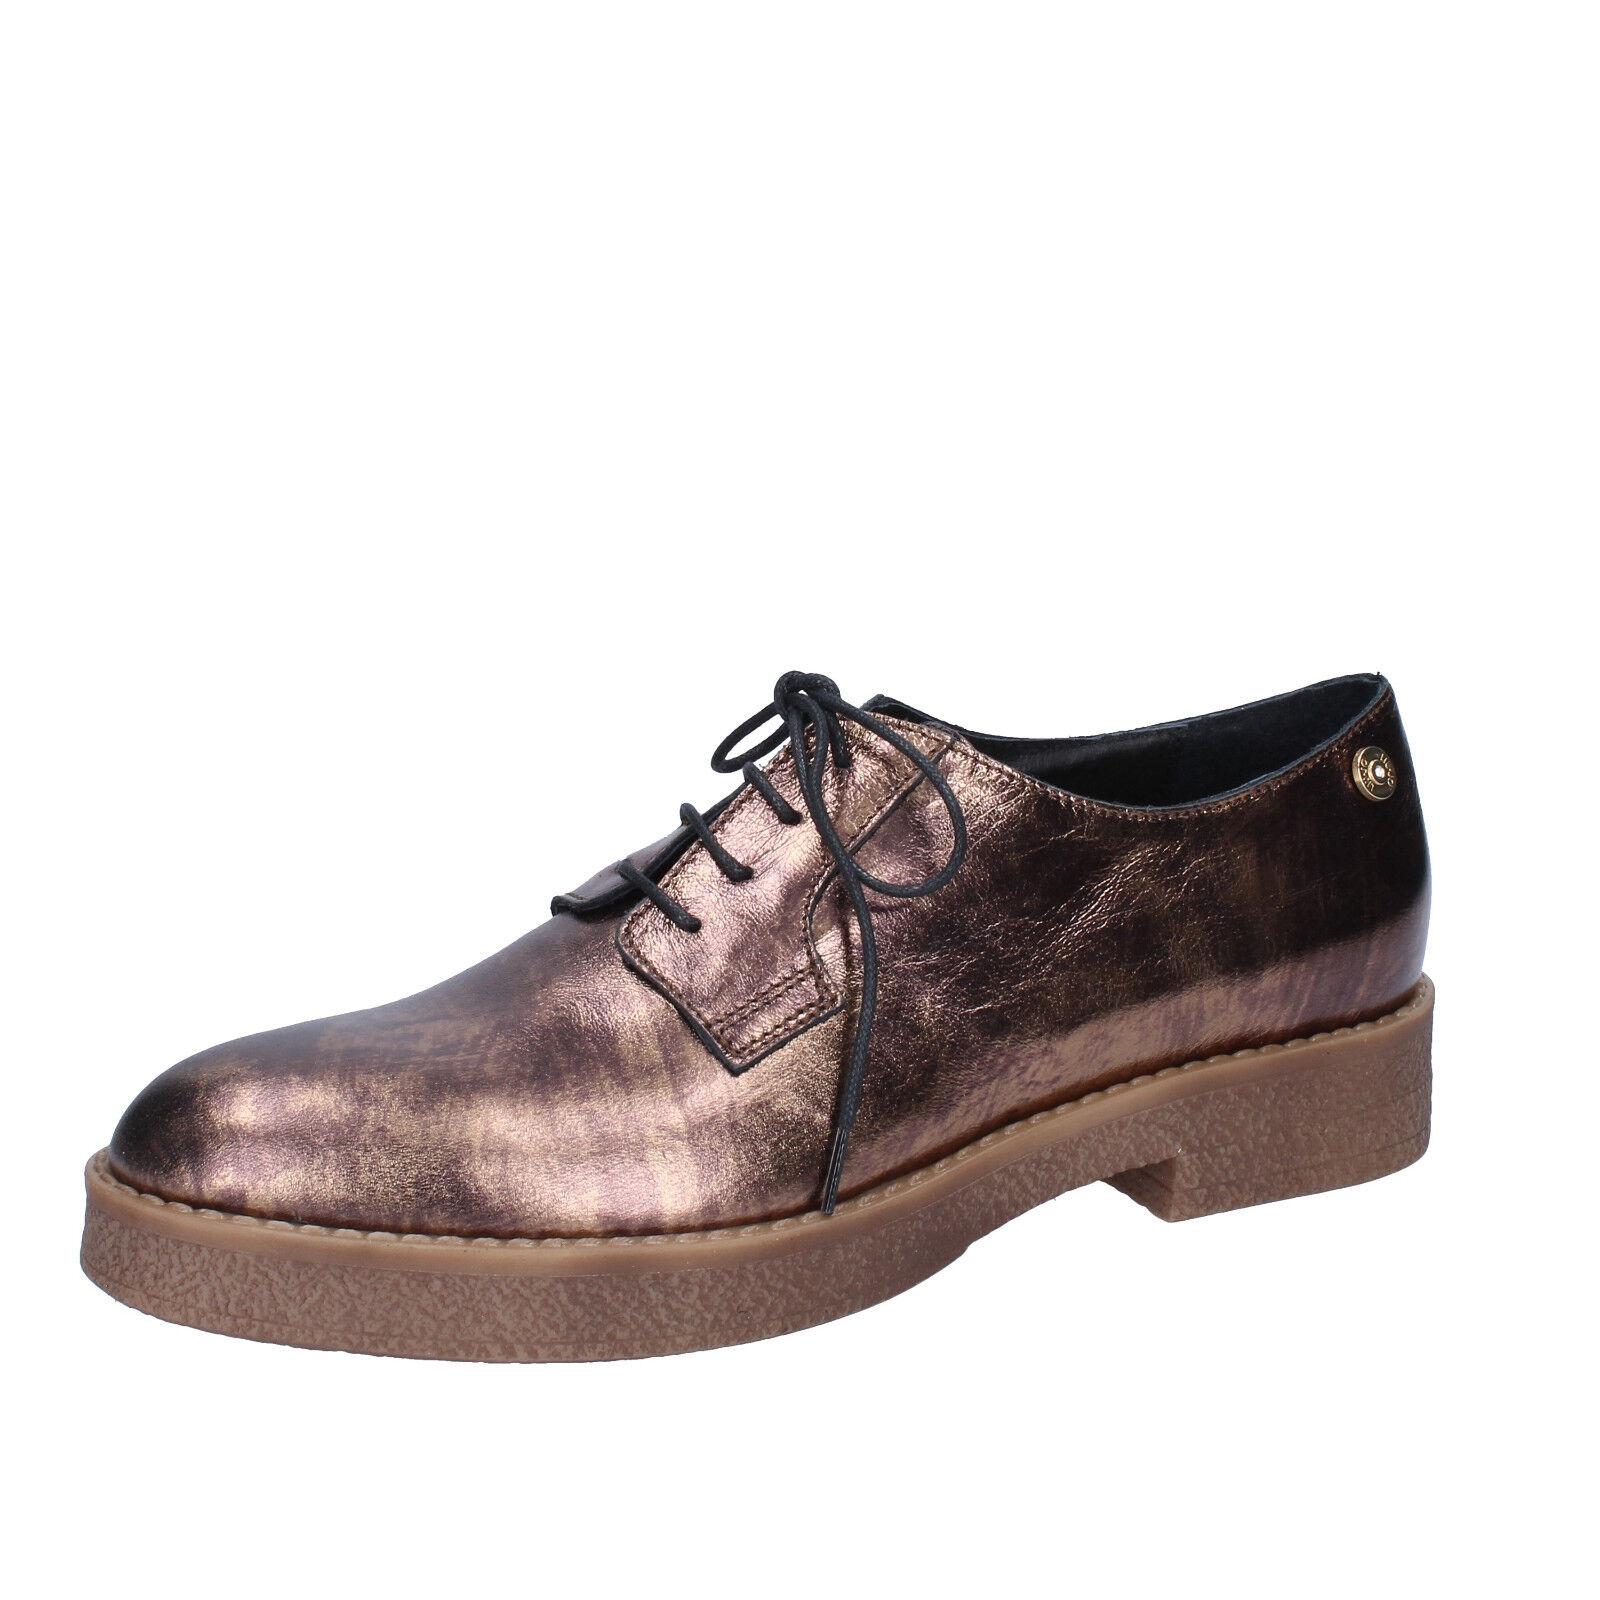 scarpe donna LIU JO 36 EU classiche bronzo pelle BY591-36